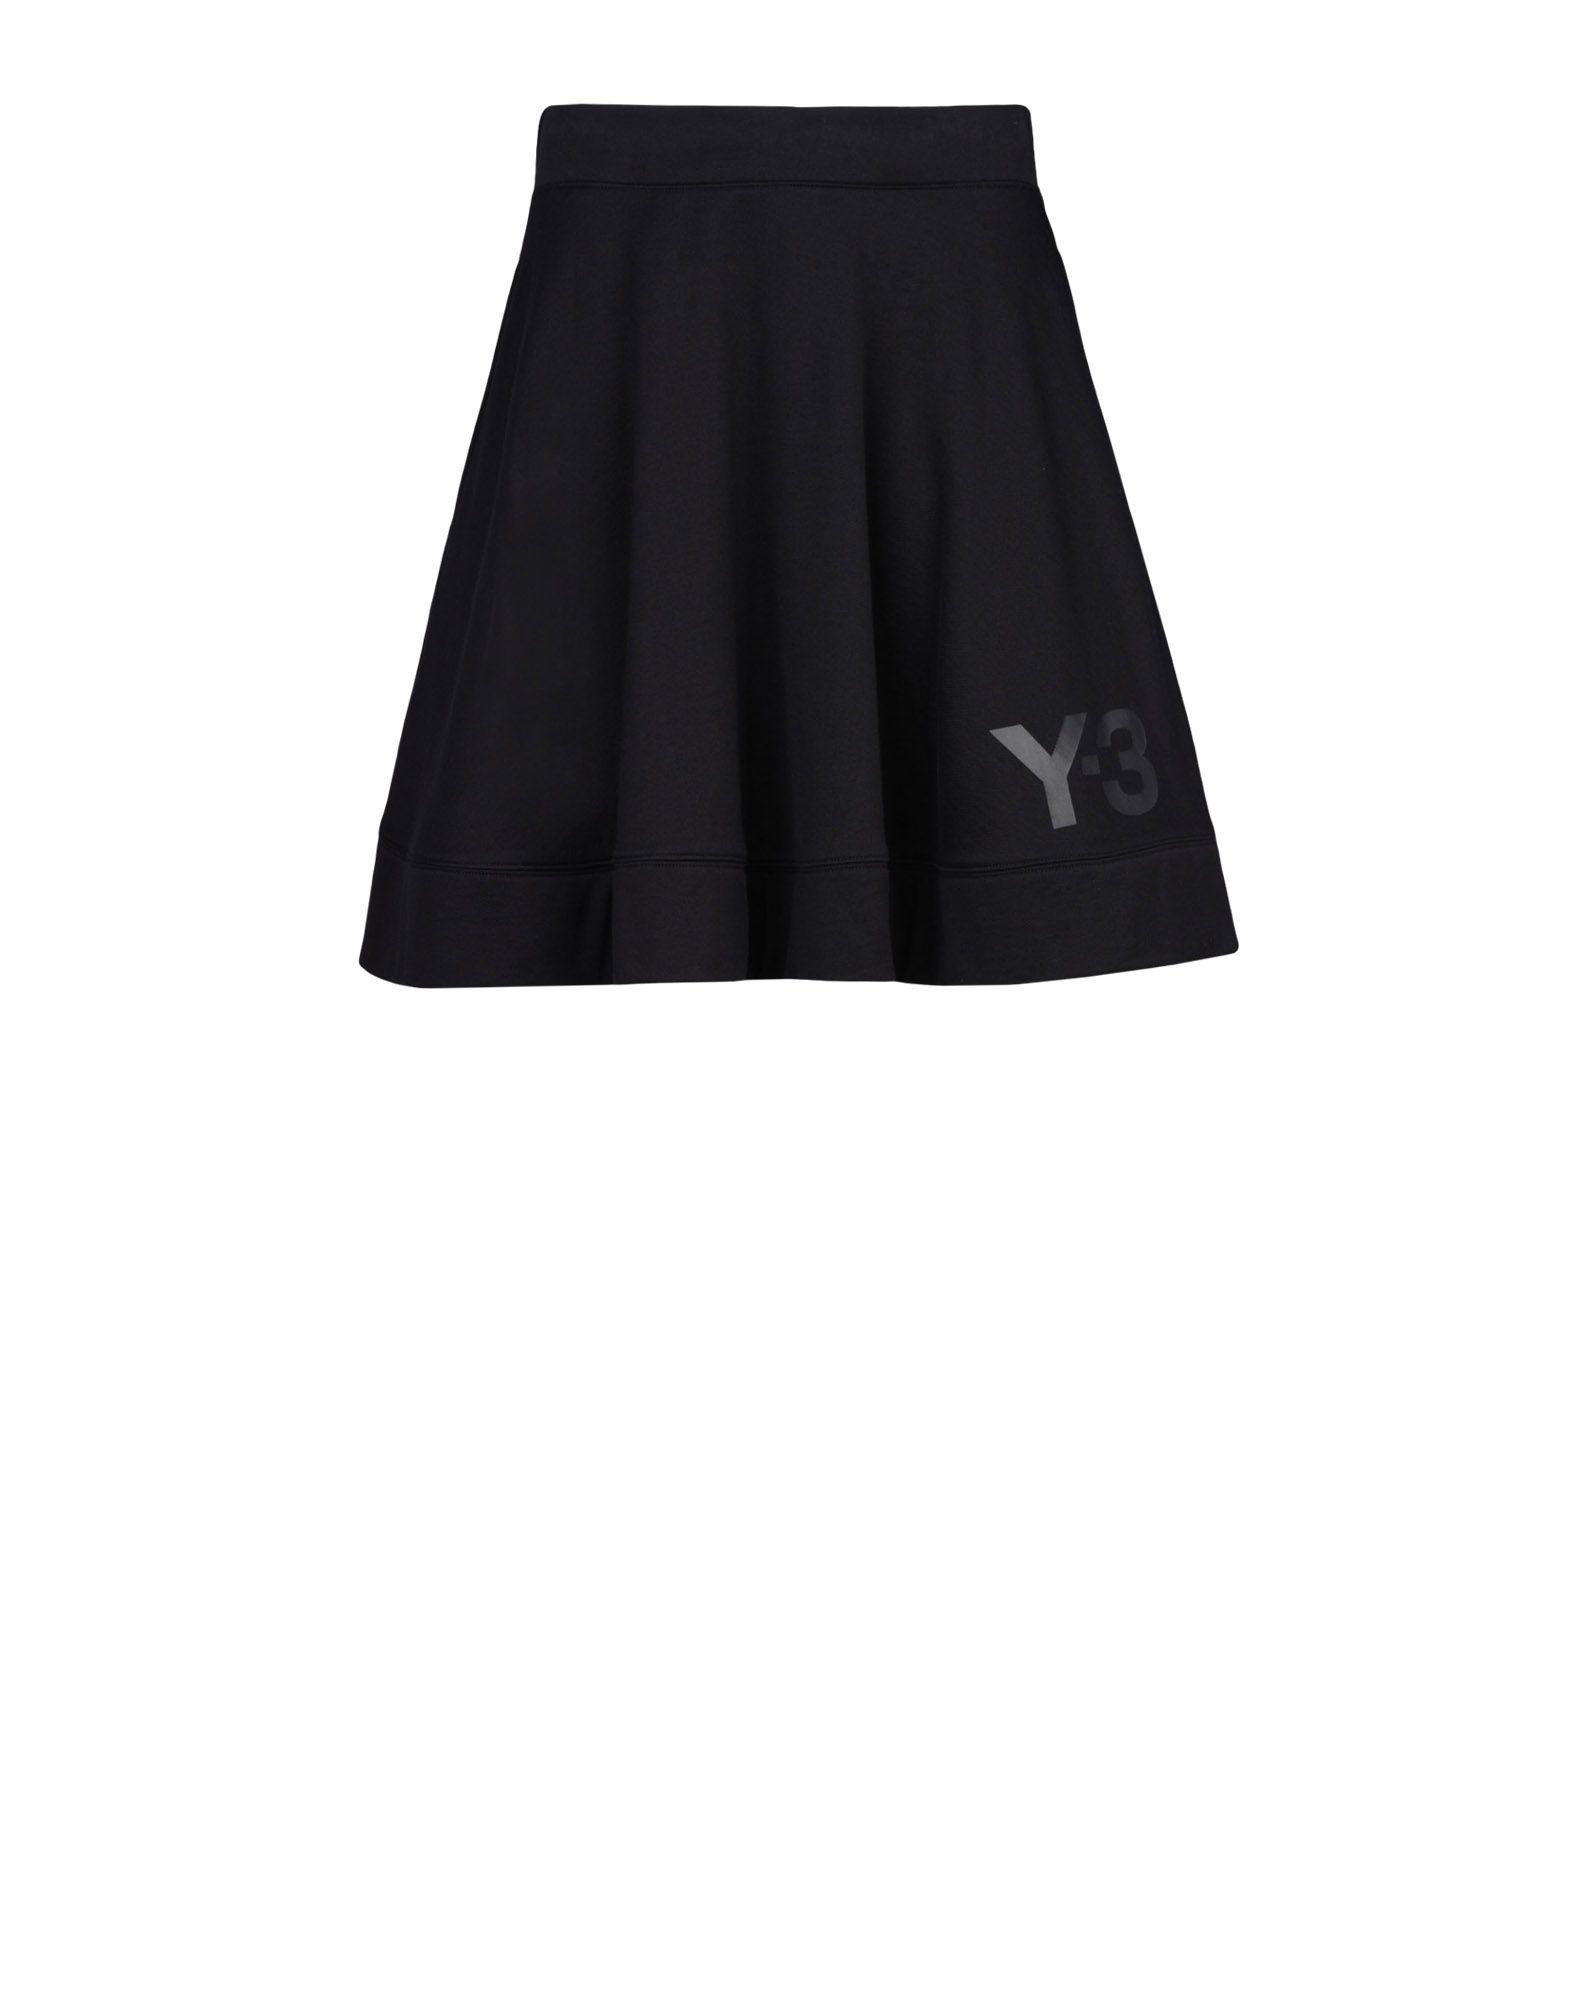 Y 3 DANCER SKIRT Knee Length Skirts for Women | Adidas Y-3 ...